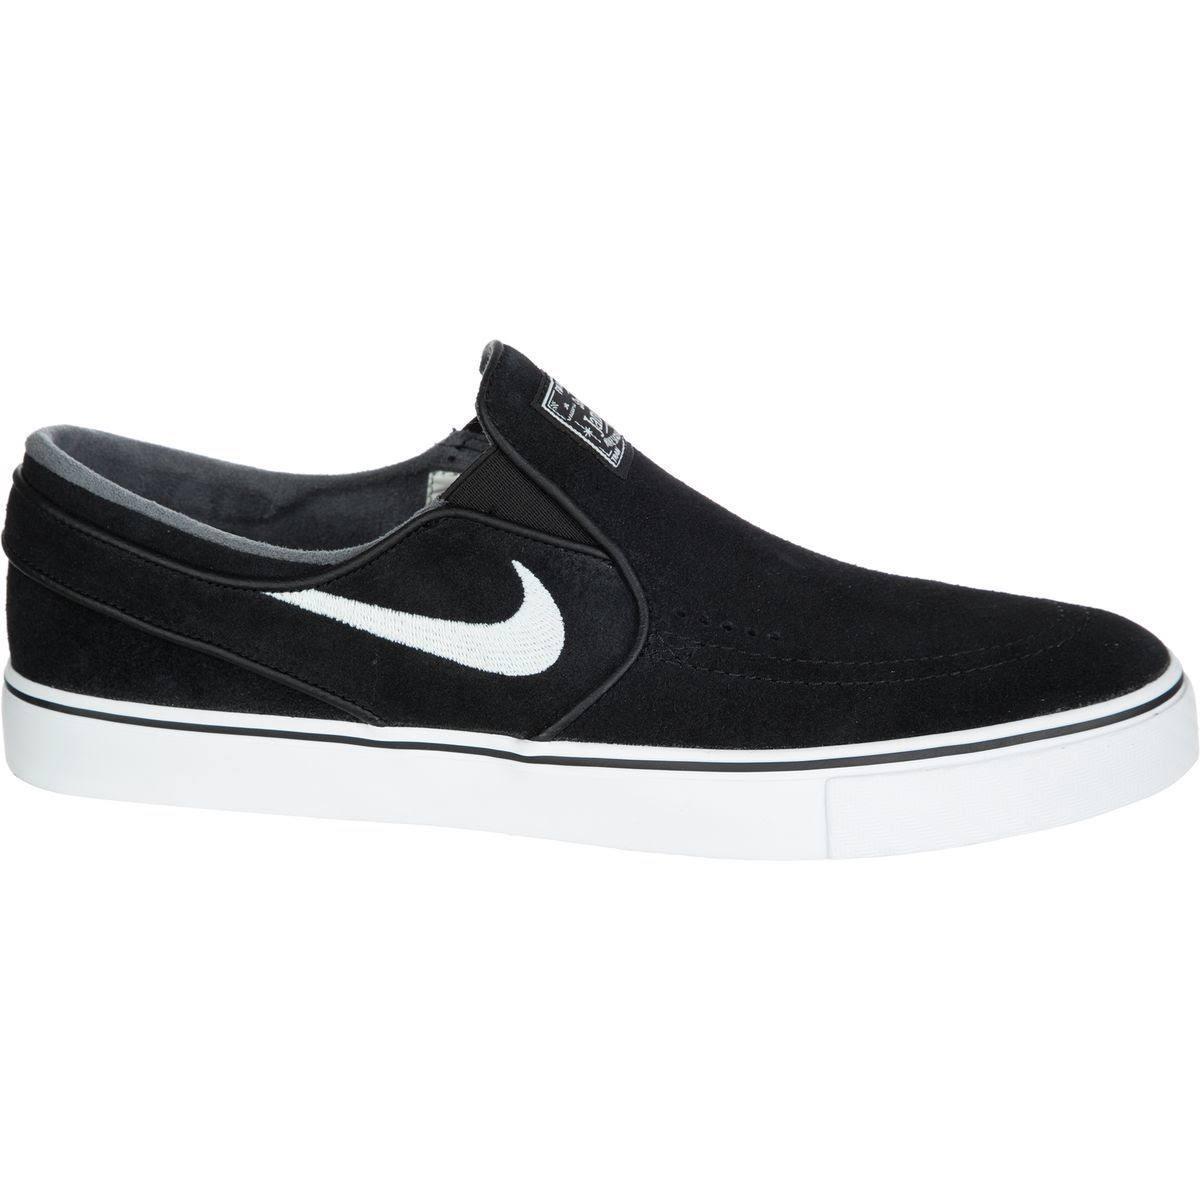 Nike D 5 Slip m Janoski Größe 11 Schwarz Männer qvr6nAPFq